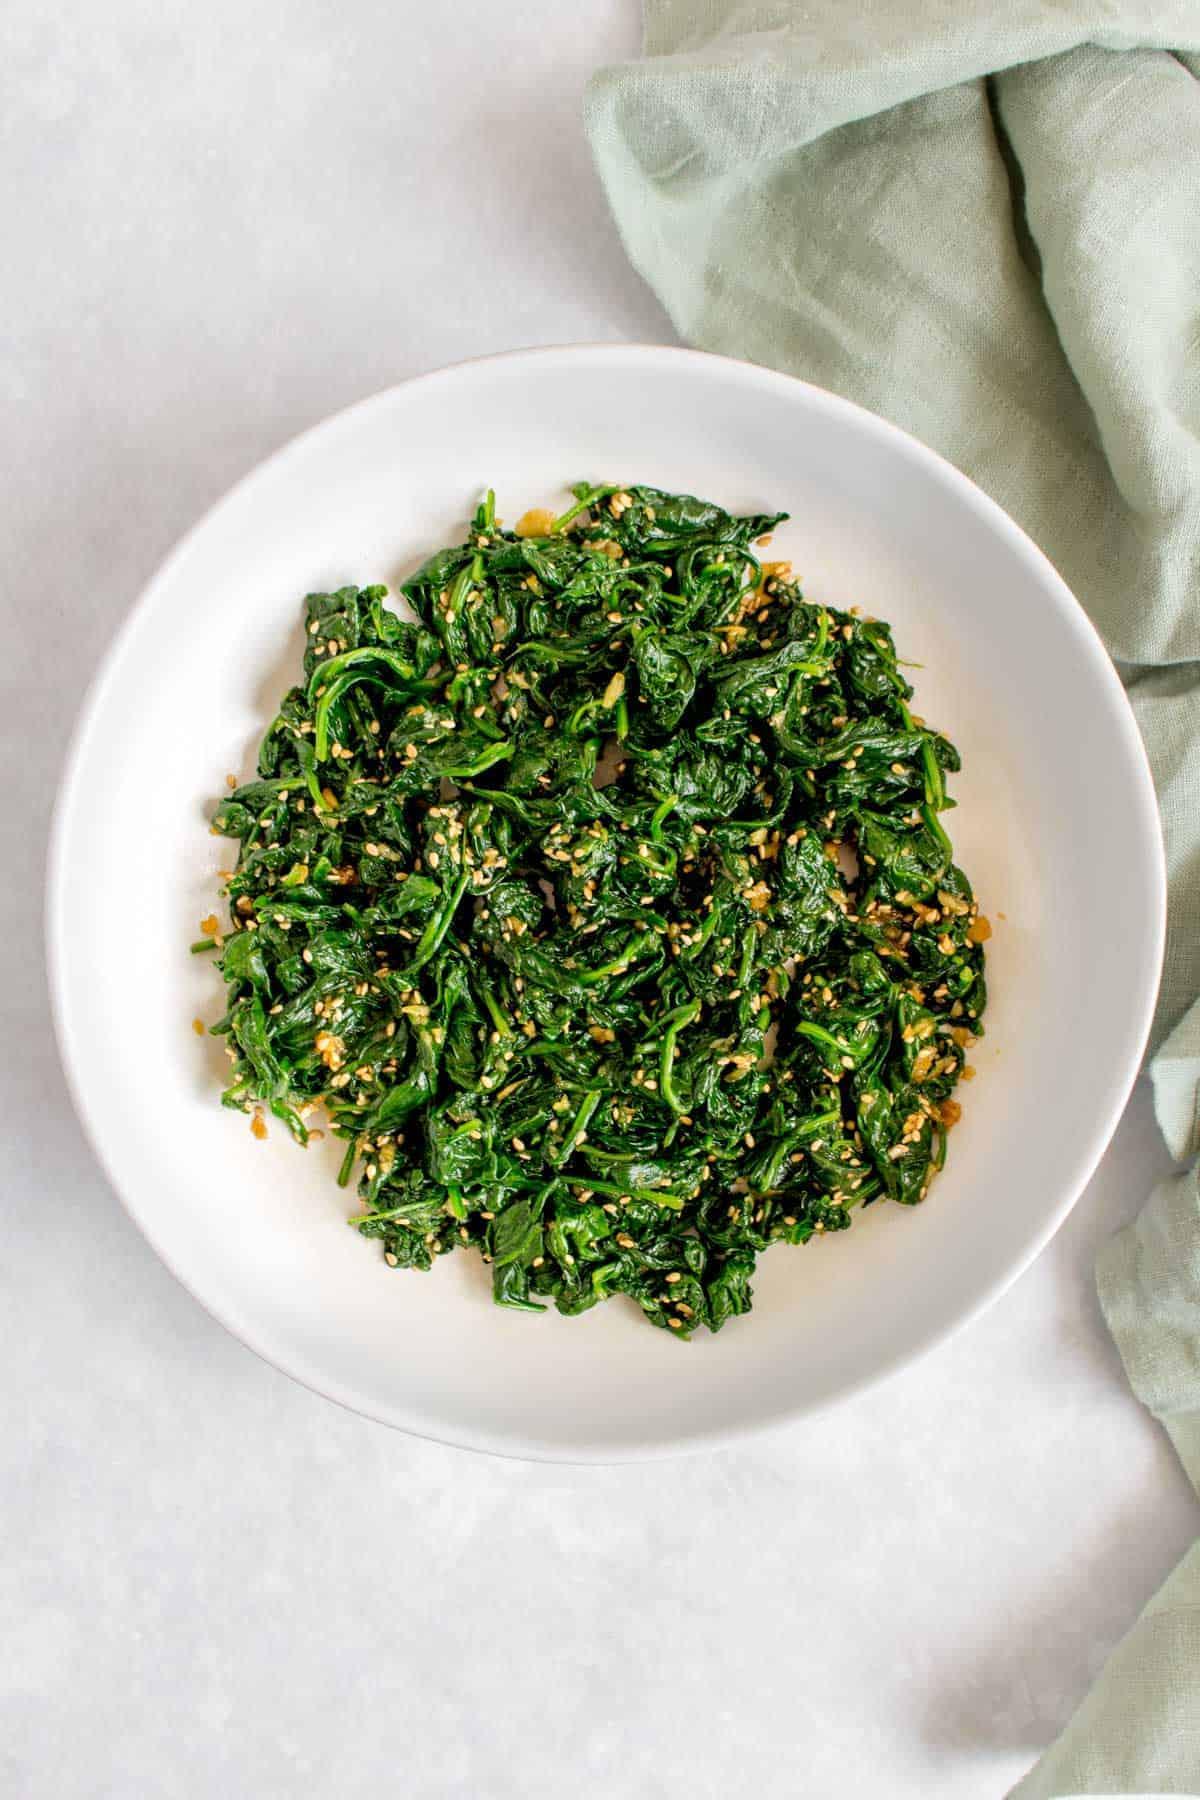 Seasoned spinach in a plate (Sigumchi Namul).